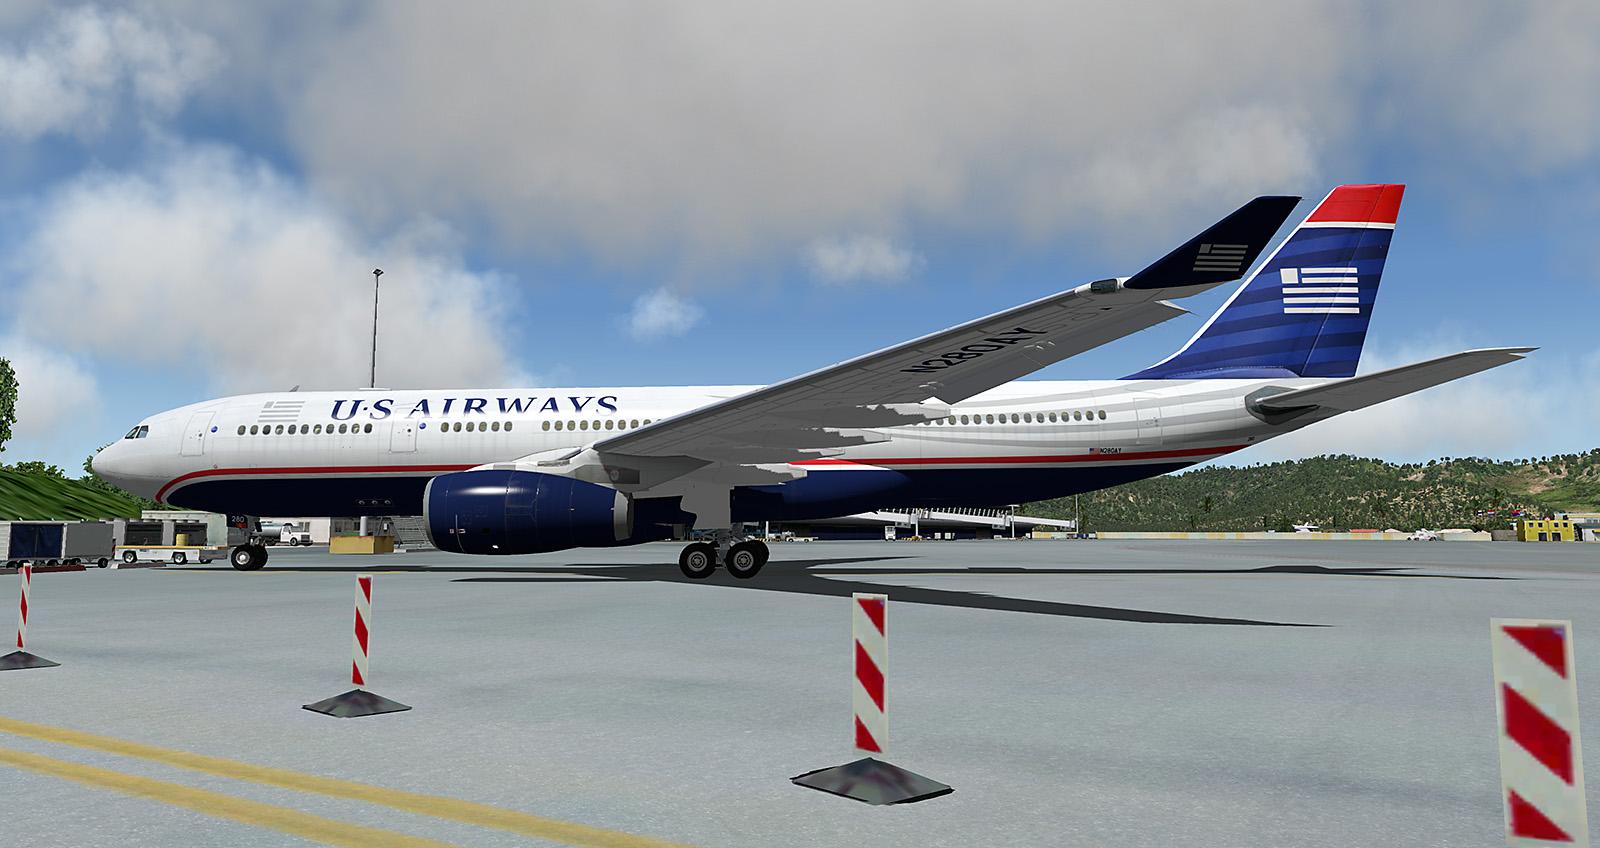 Jardesign A330 US Airways N280AY - Aircraft Skins - Liveries